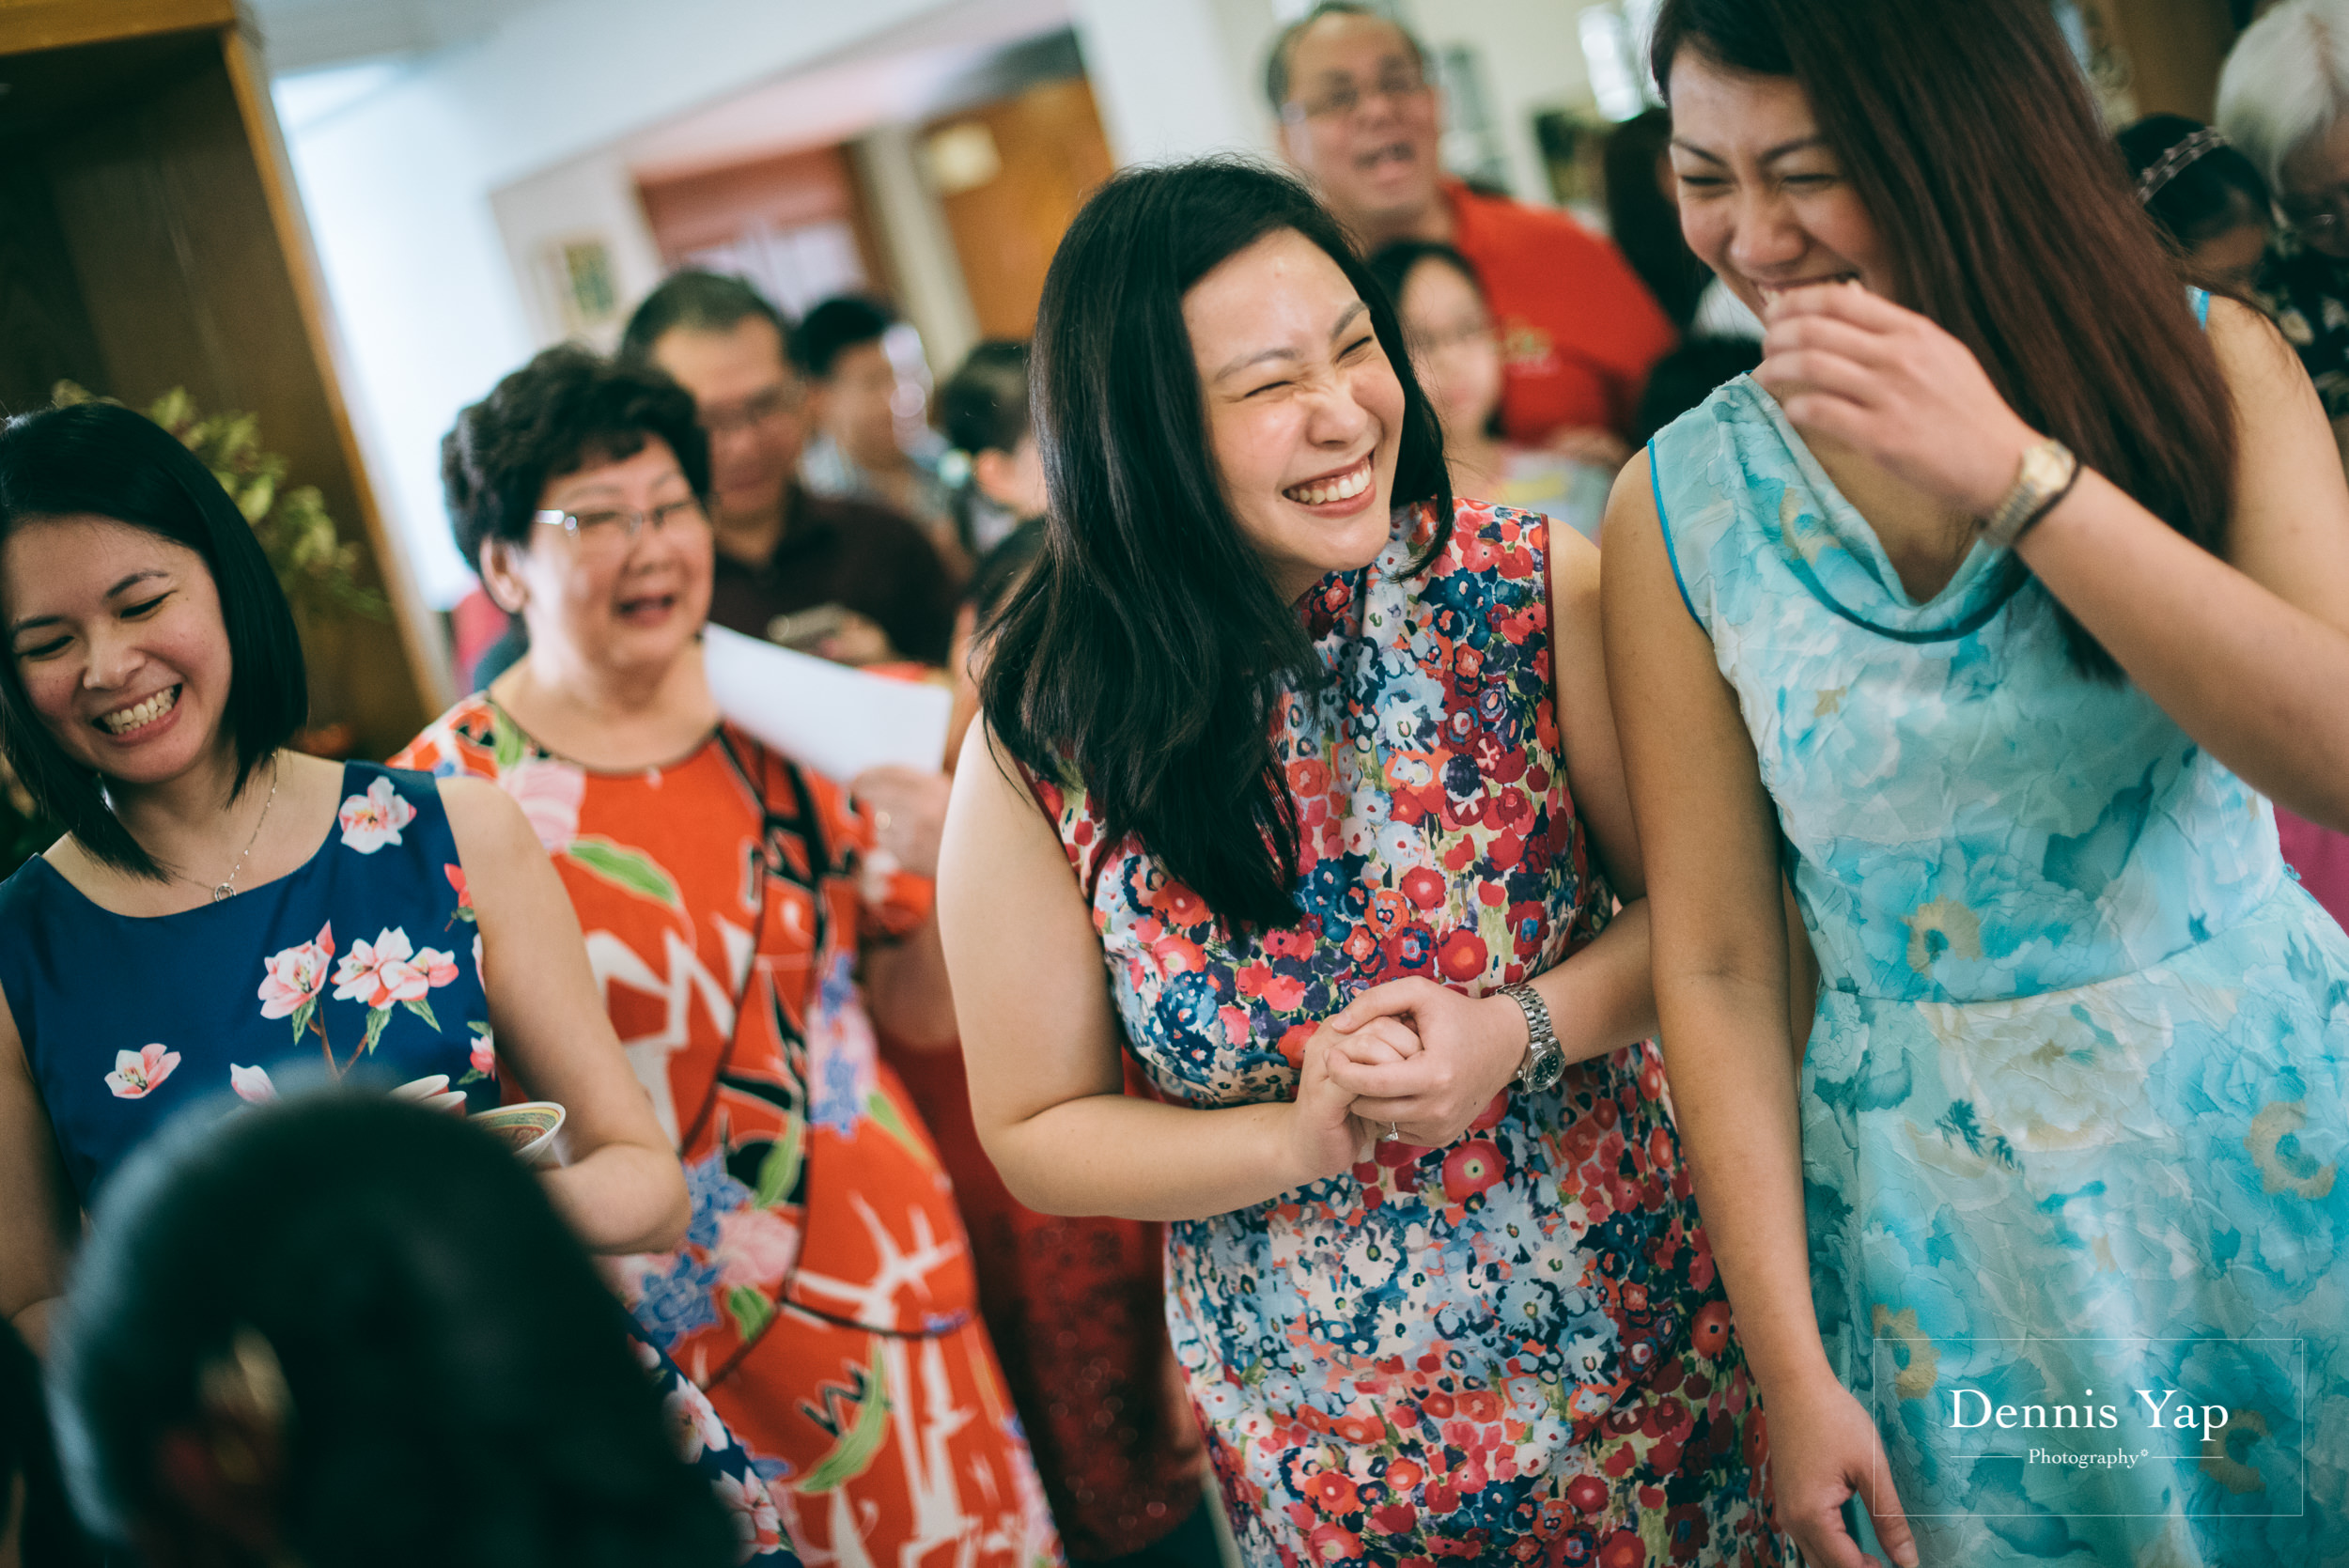 wai keong jenny wedding day bangsar dennis yap photography emotions beloved family-22.jpg